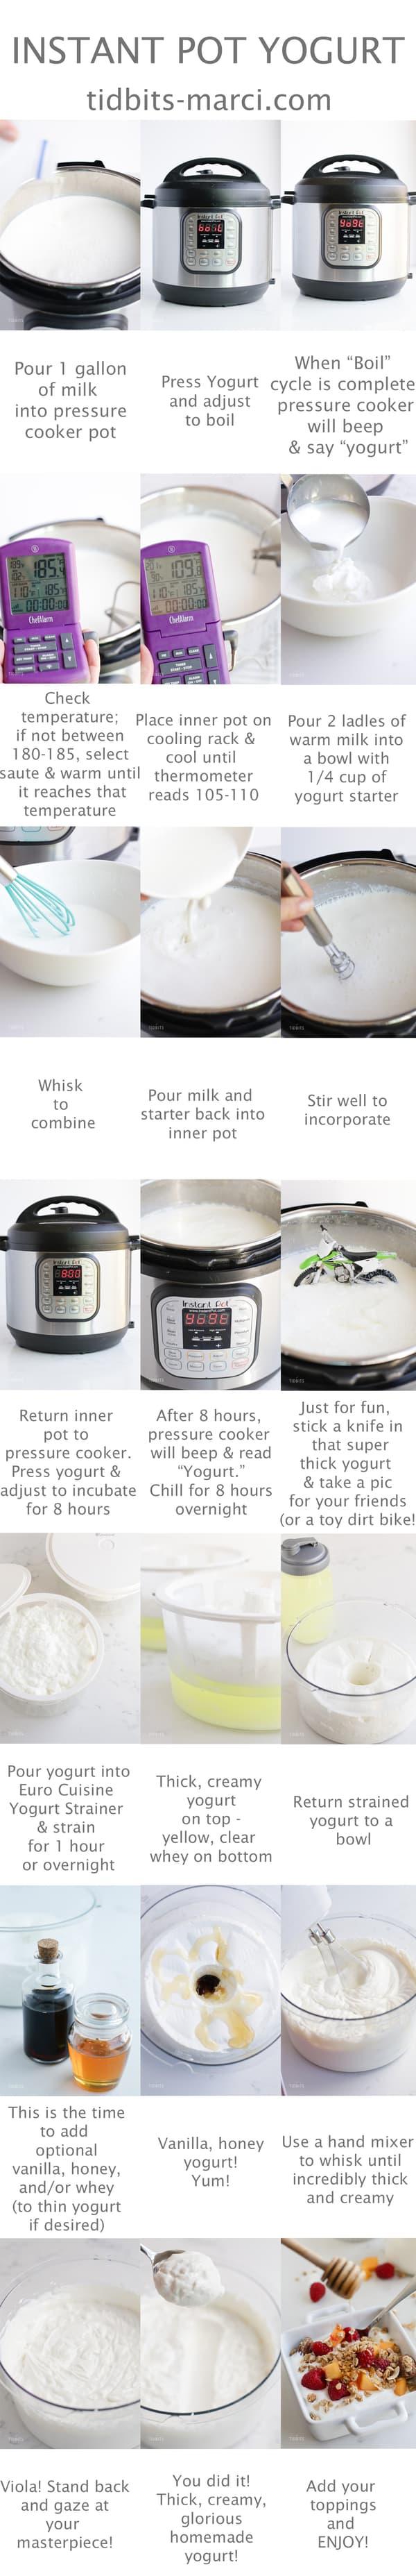 instant pot yogurt step by step collage